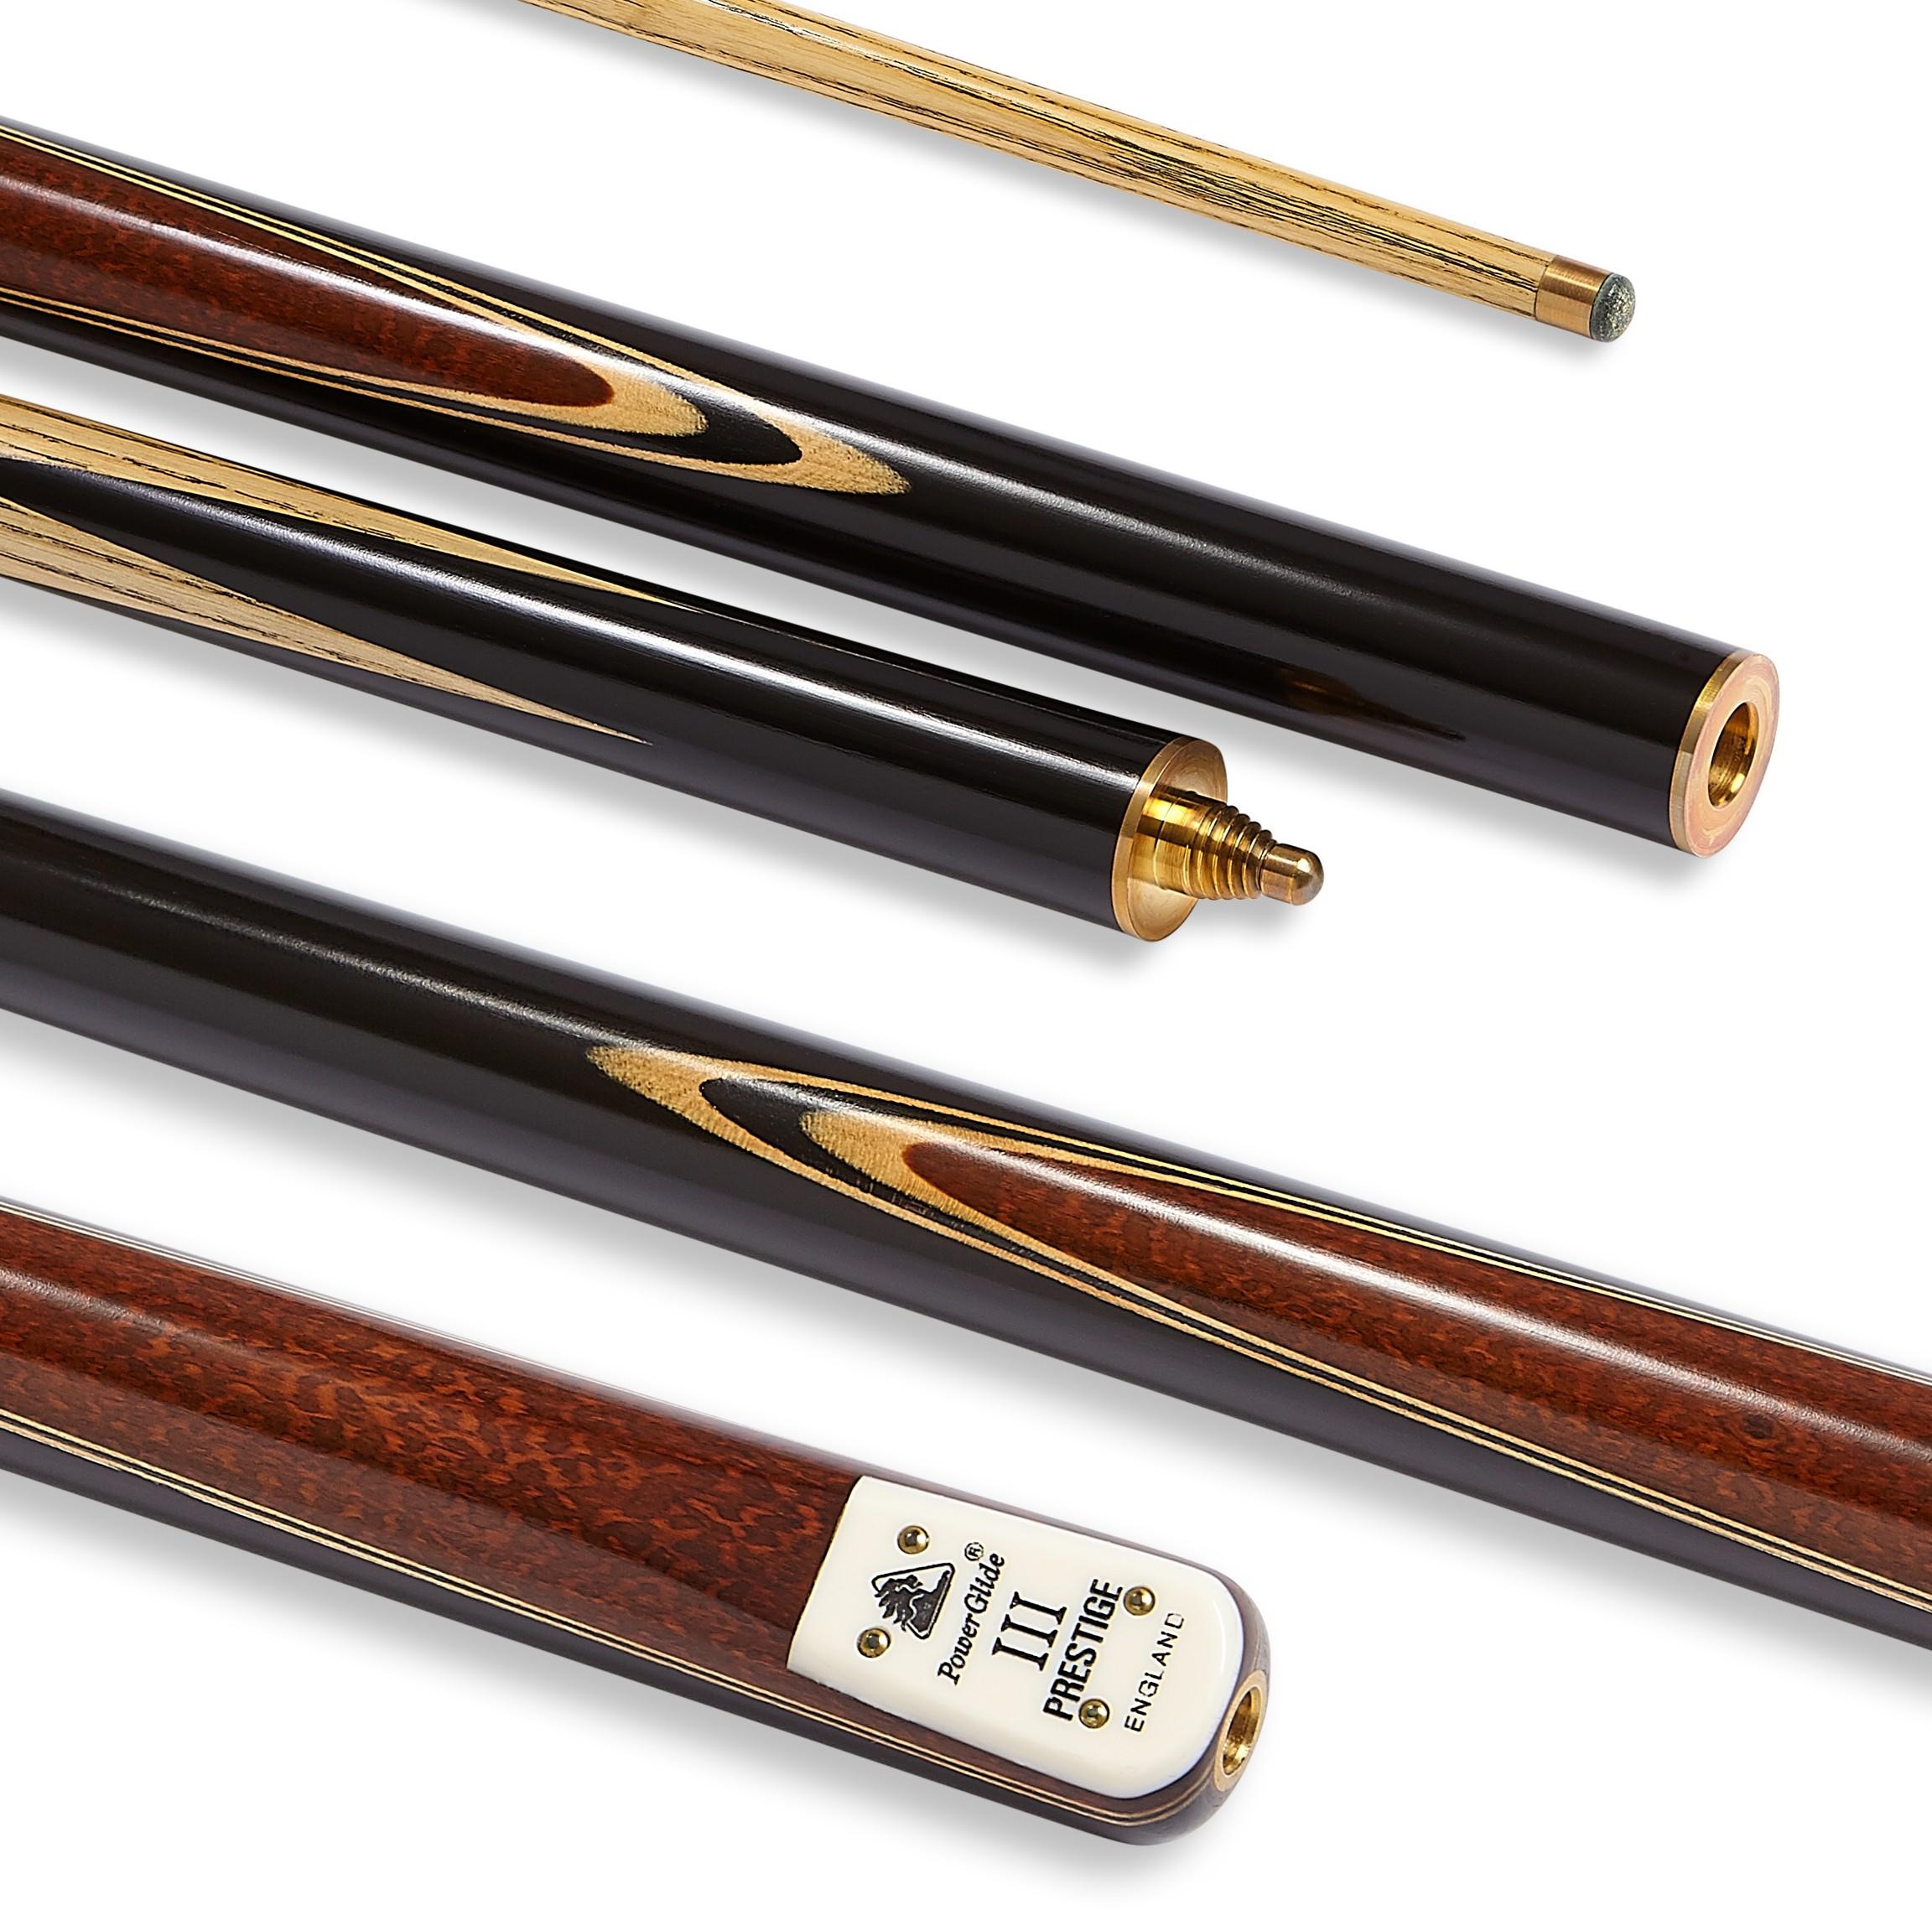 Prestige III Snooker Cue 3/4 Split 9.5mm Tip